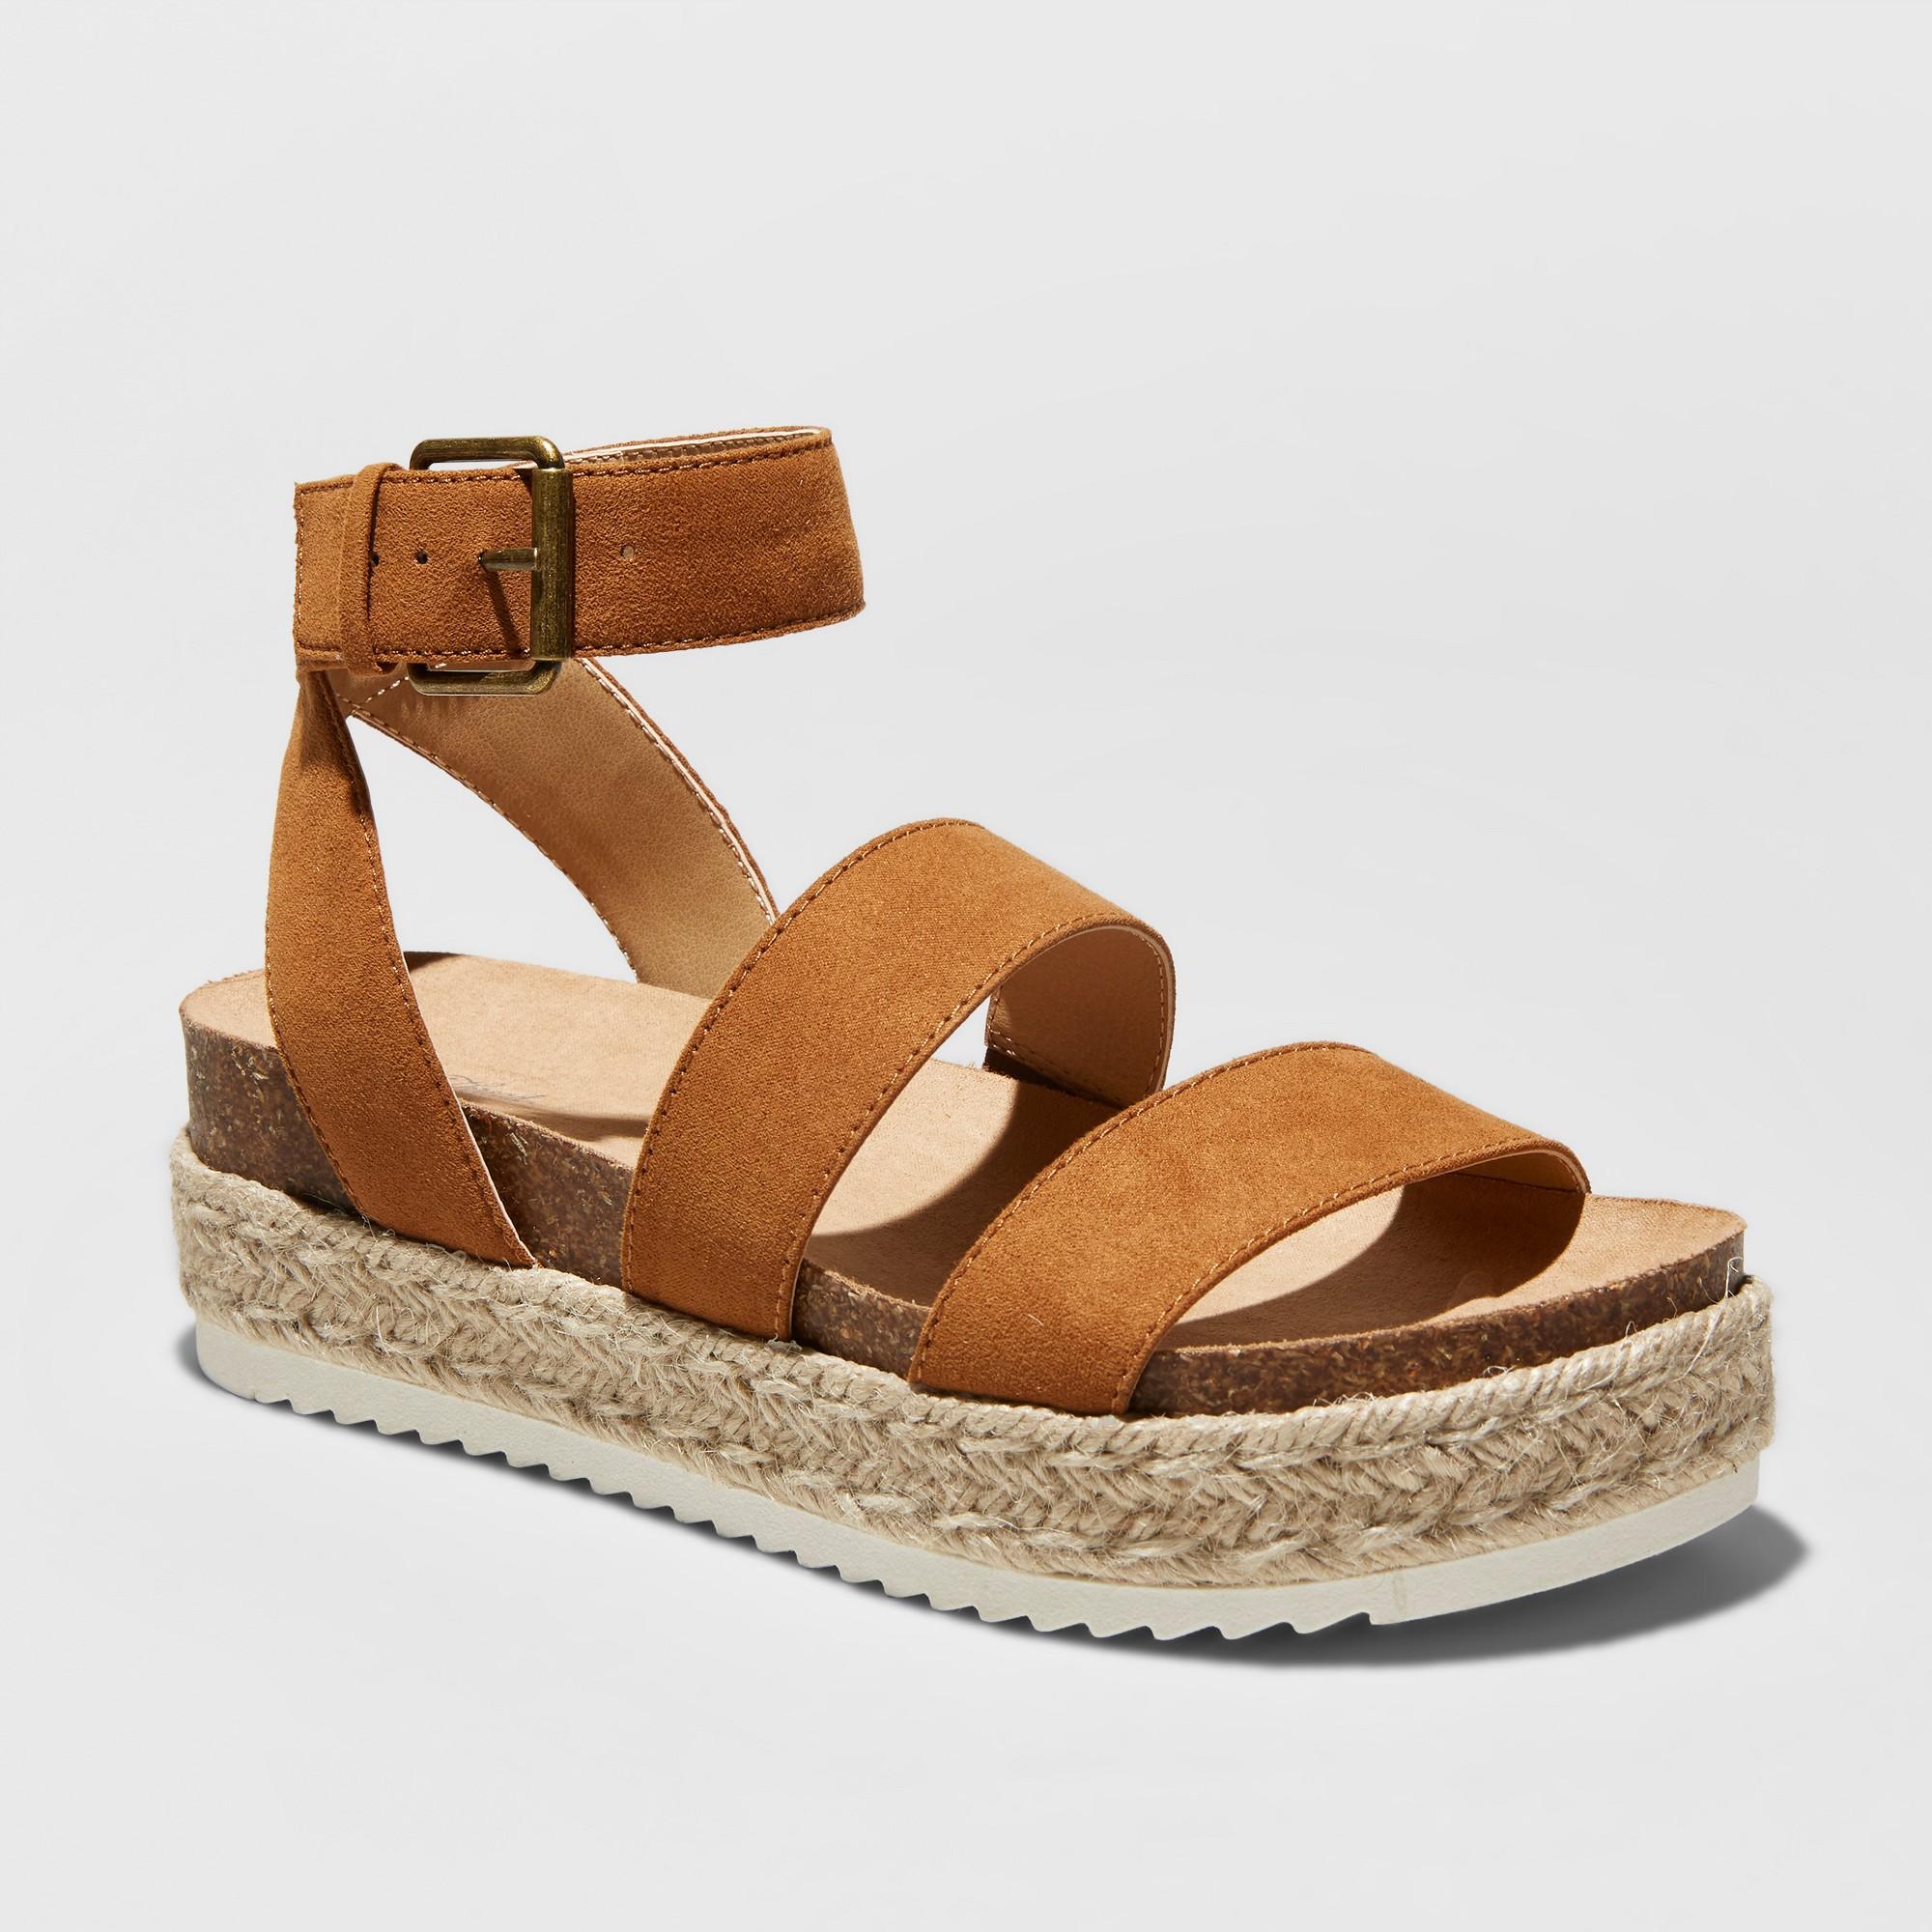 600a628eb48 Women s Agnes Quarter Strap Espadrille Flatform Sandals - Universal Thread  Cognac (Red) 11